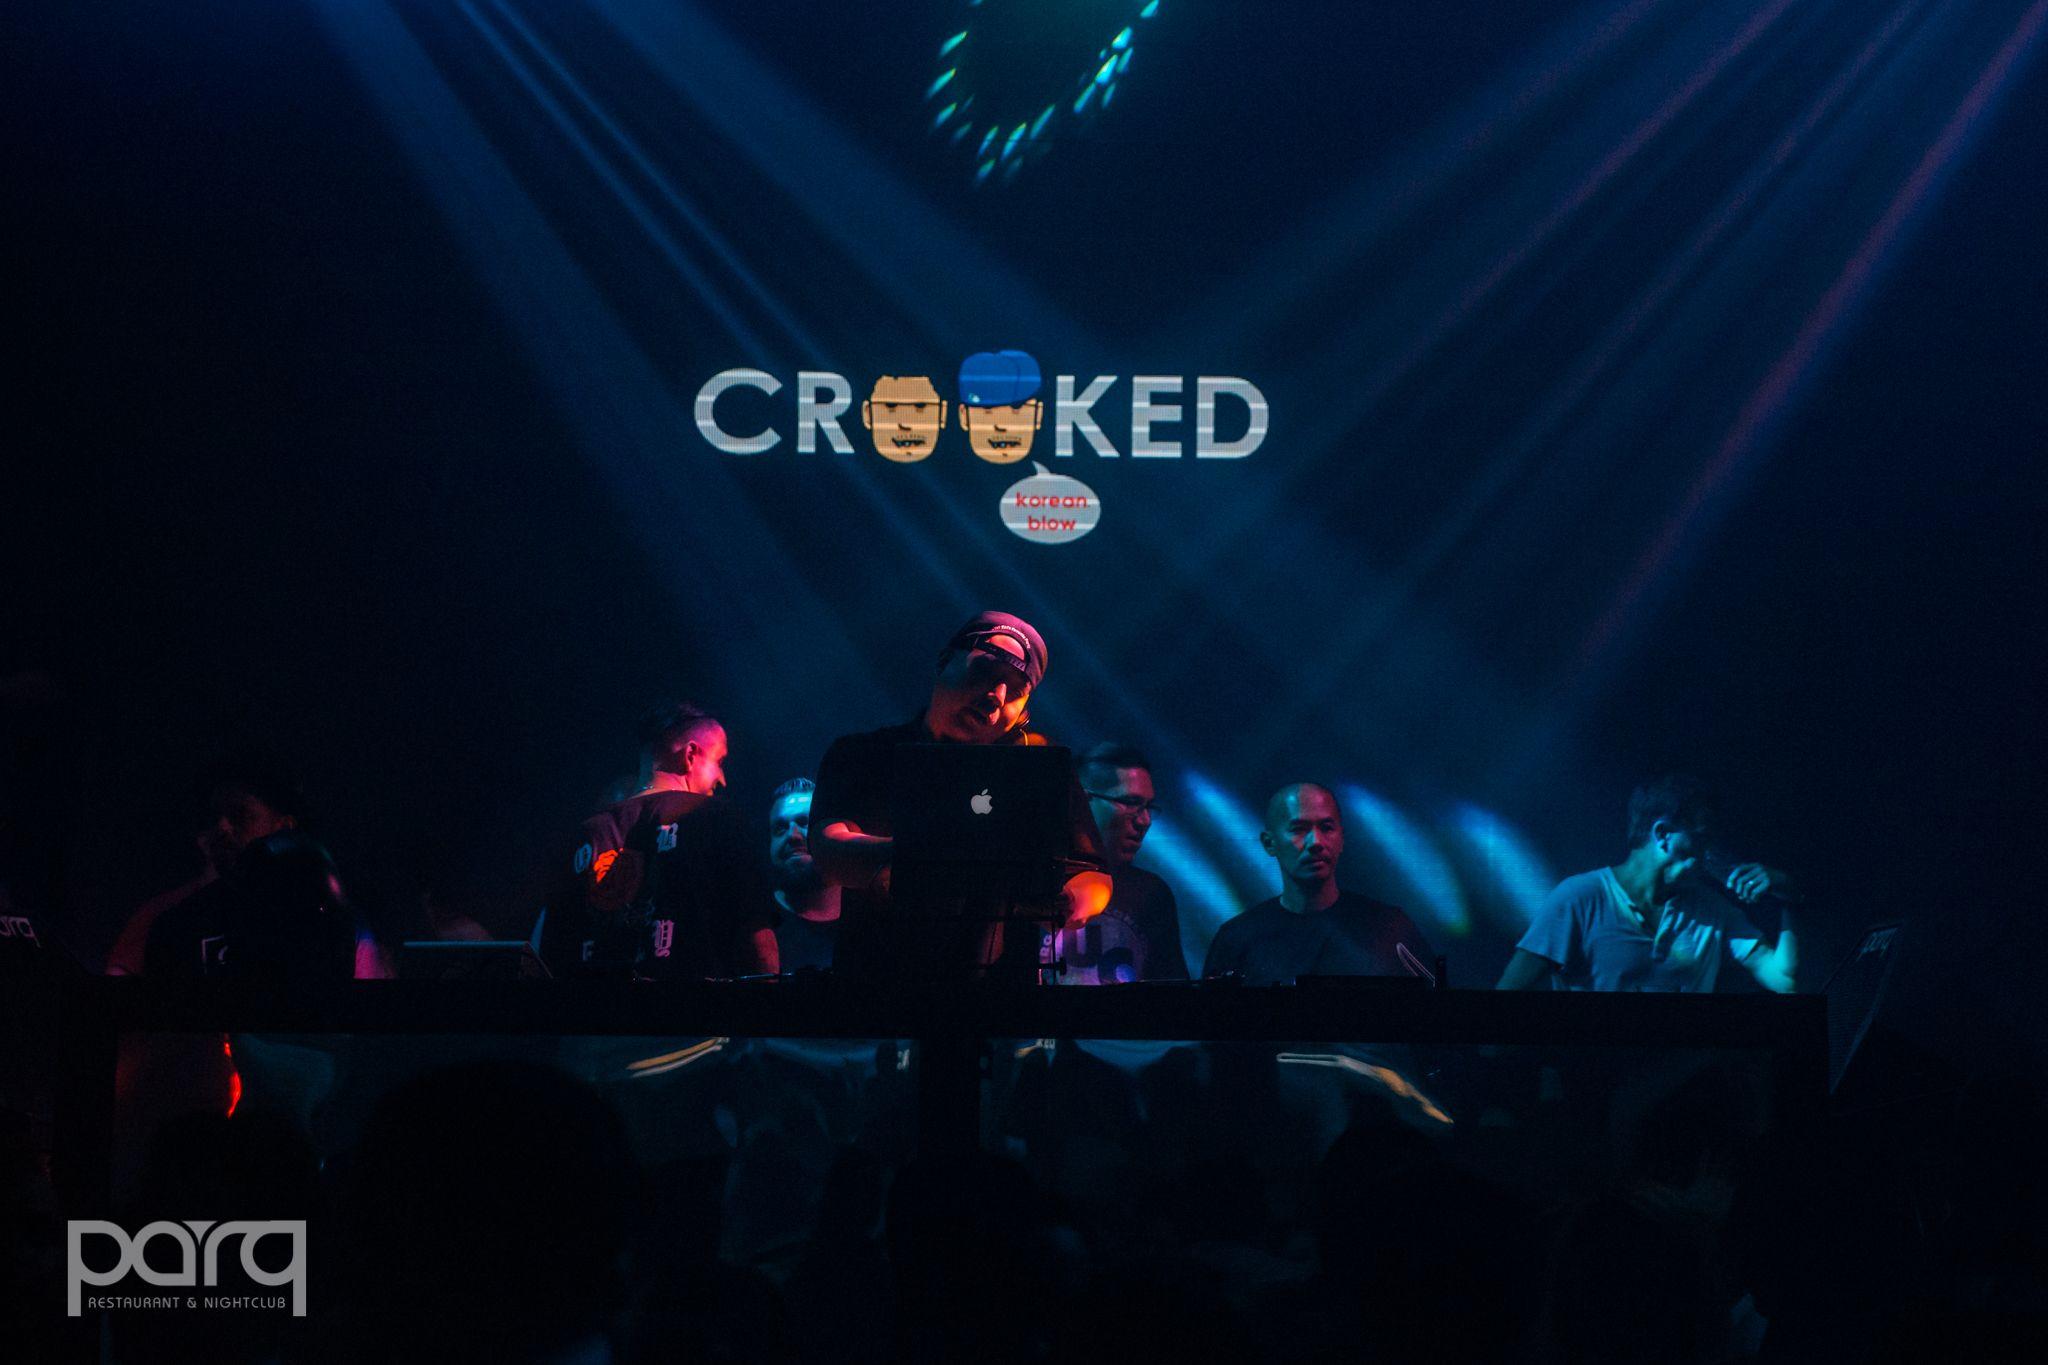 08.04.18 Parq - Crooked-1.jpg